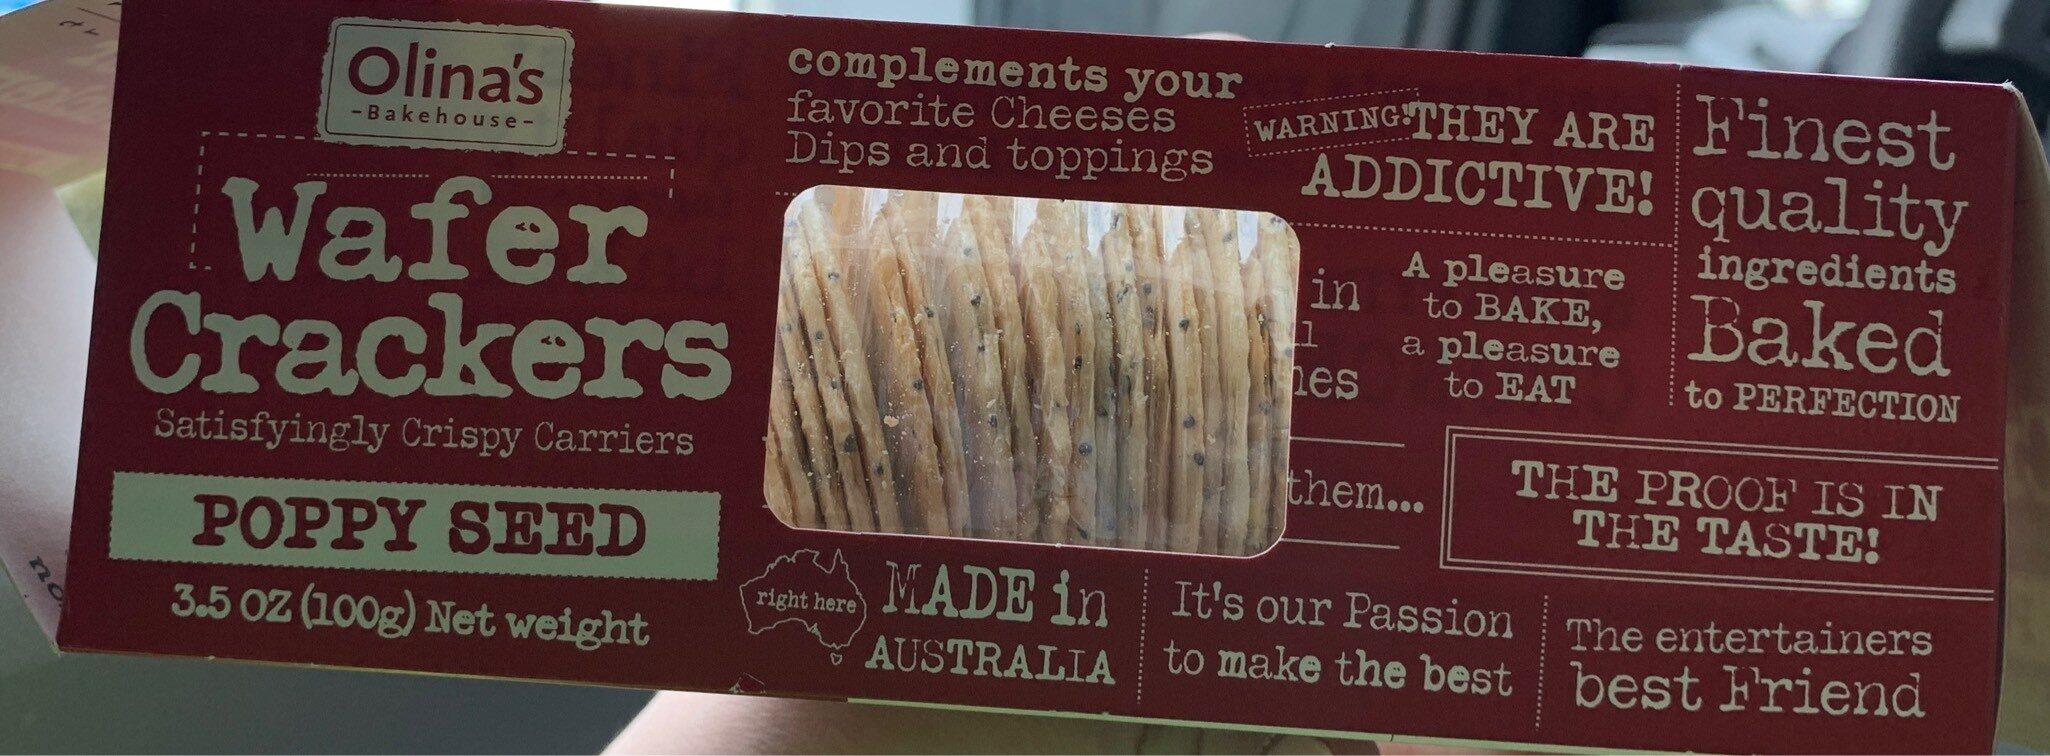 Wafer crackers - Product - en